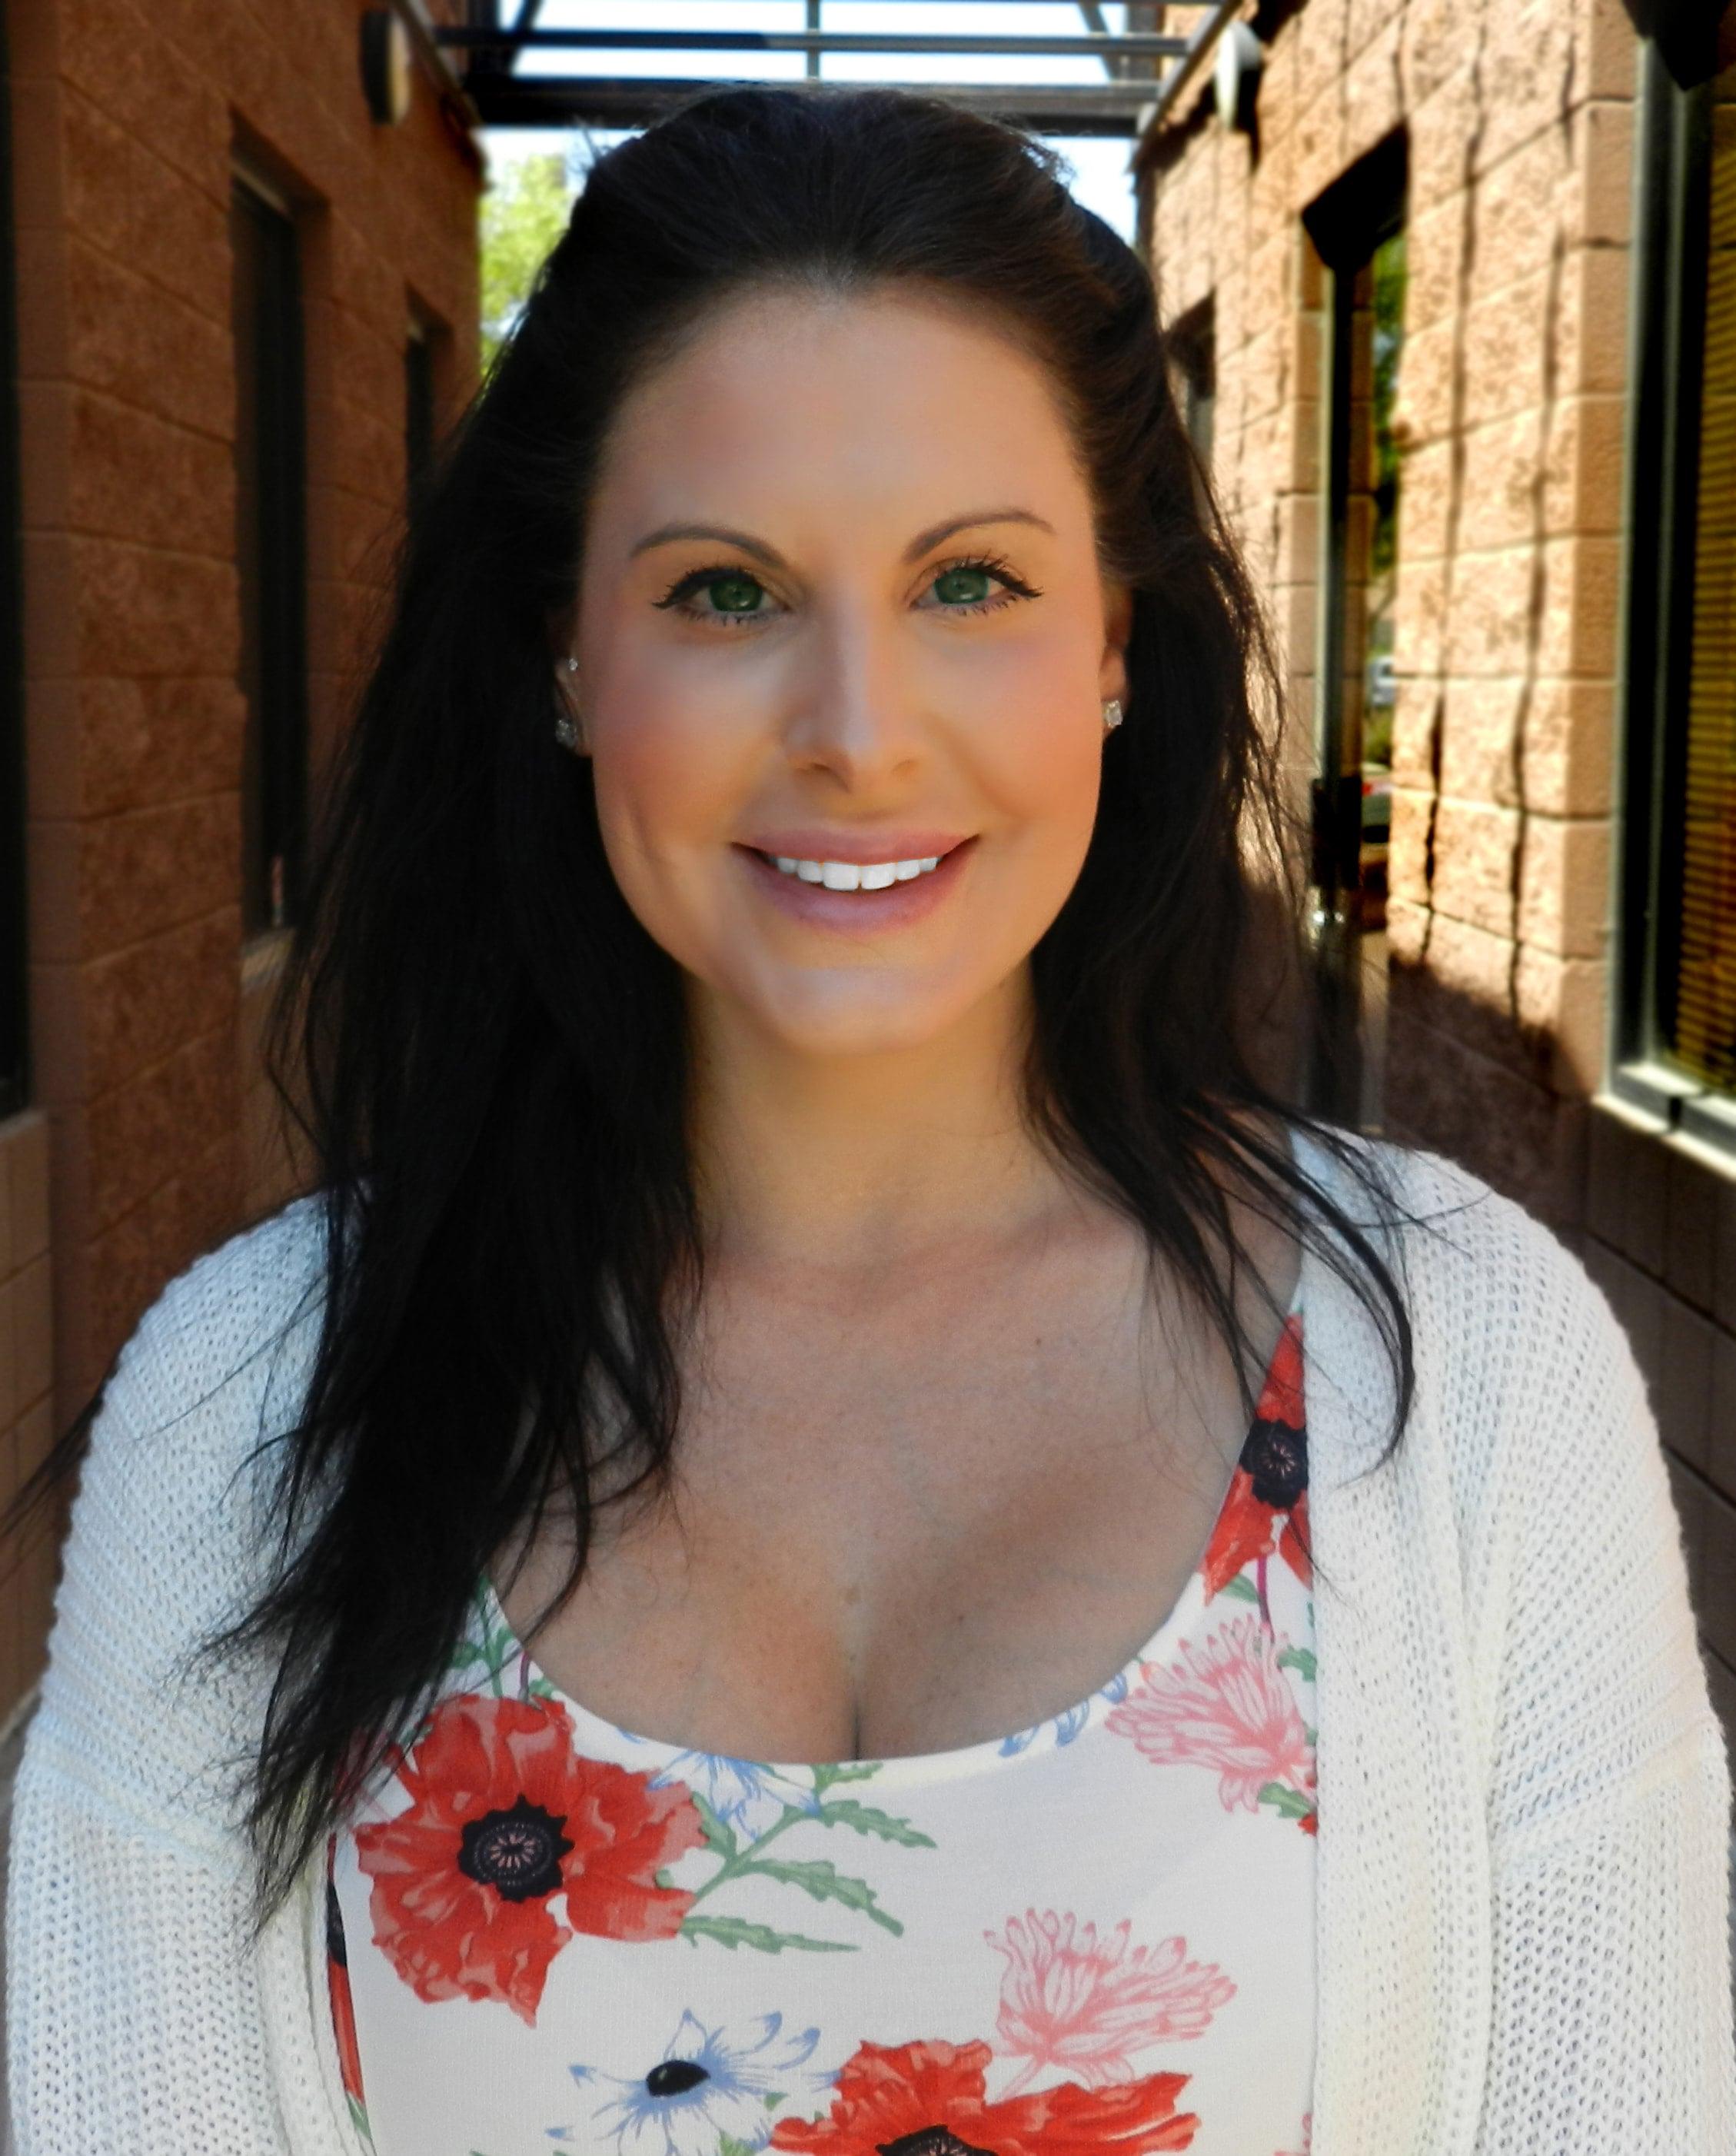 Stacy Juris Century 21 Phoenix Realtor